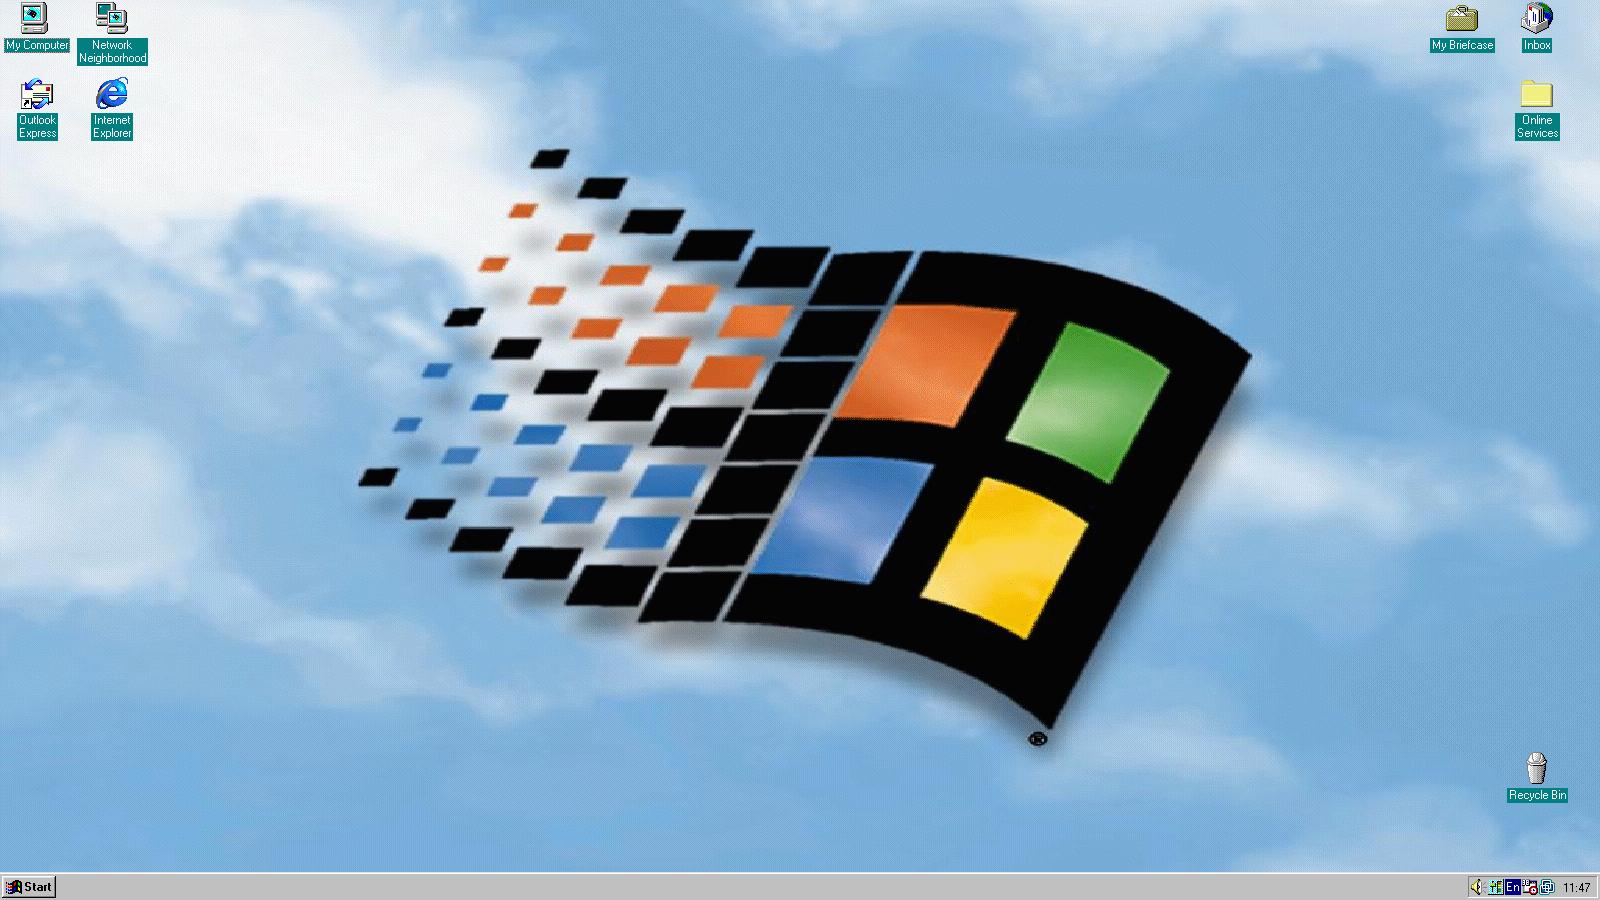 windows 95 desktop images